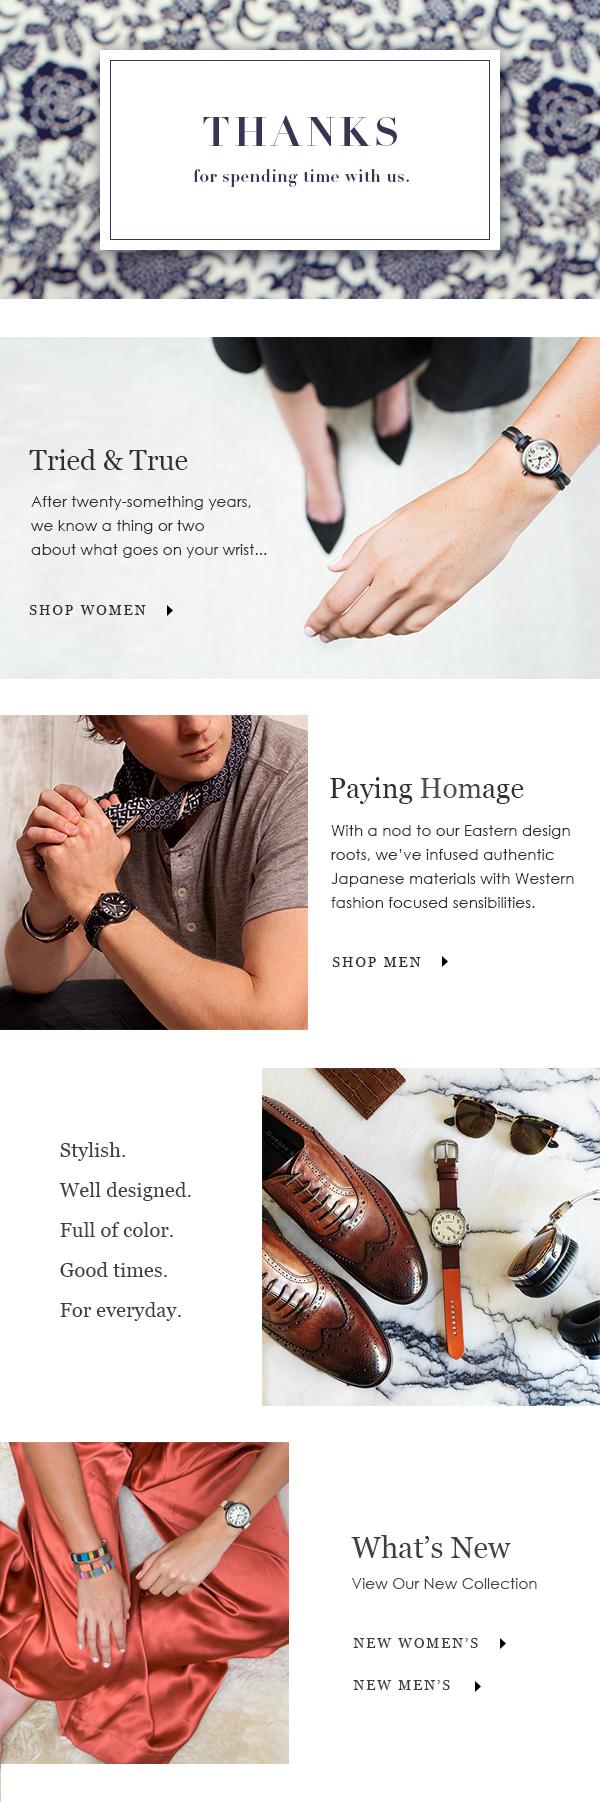 thom-venier-visual-designer-graphic-designer-email-designer.jpg